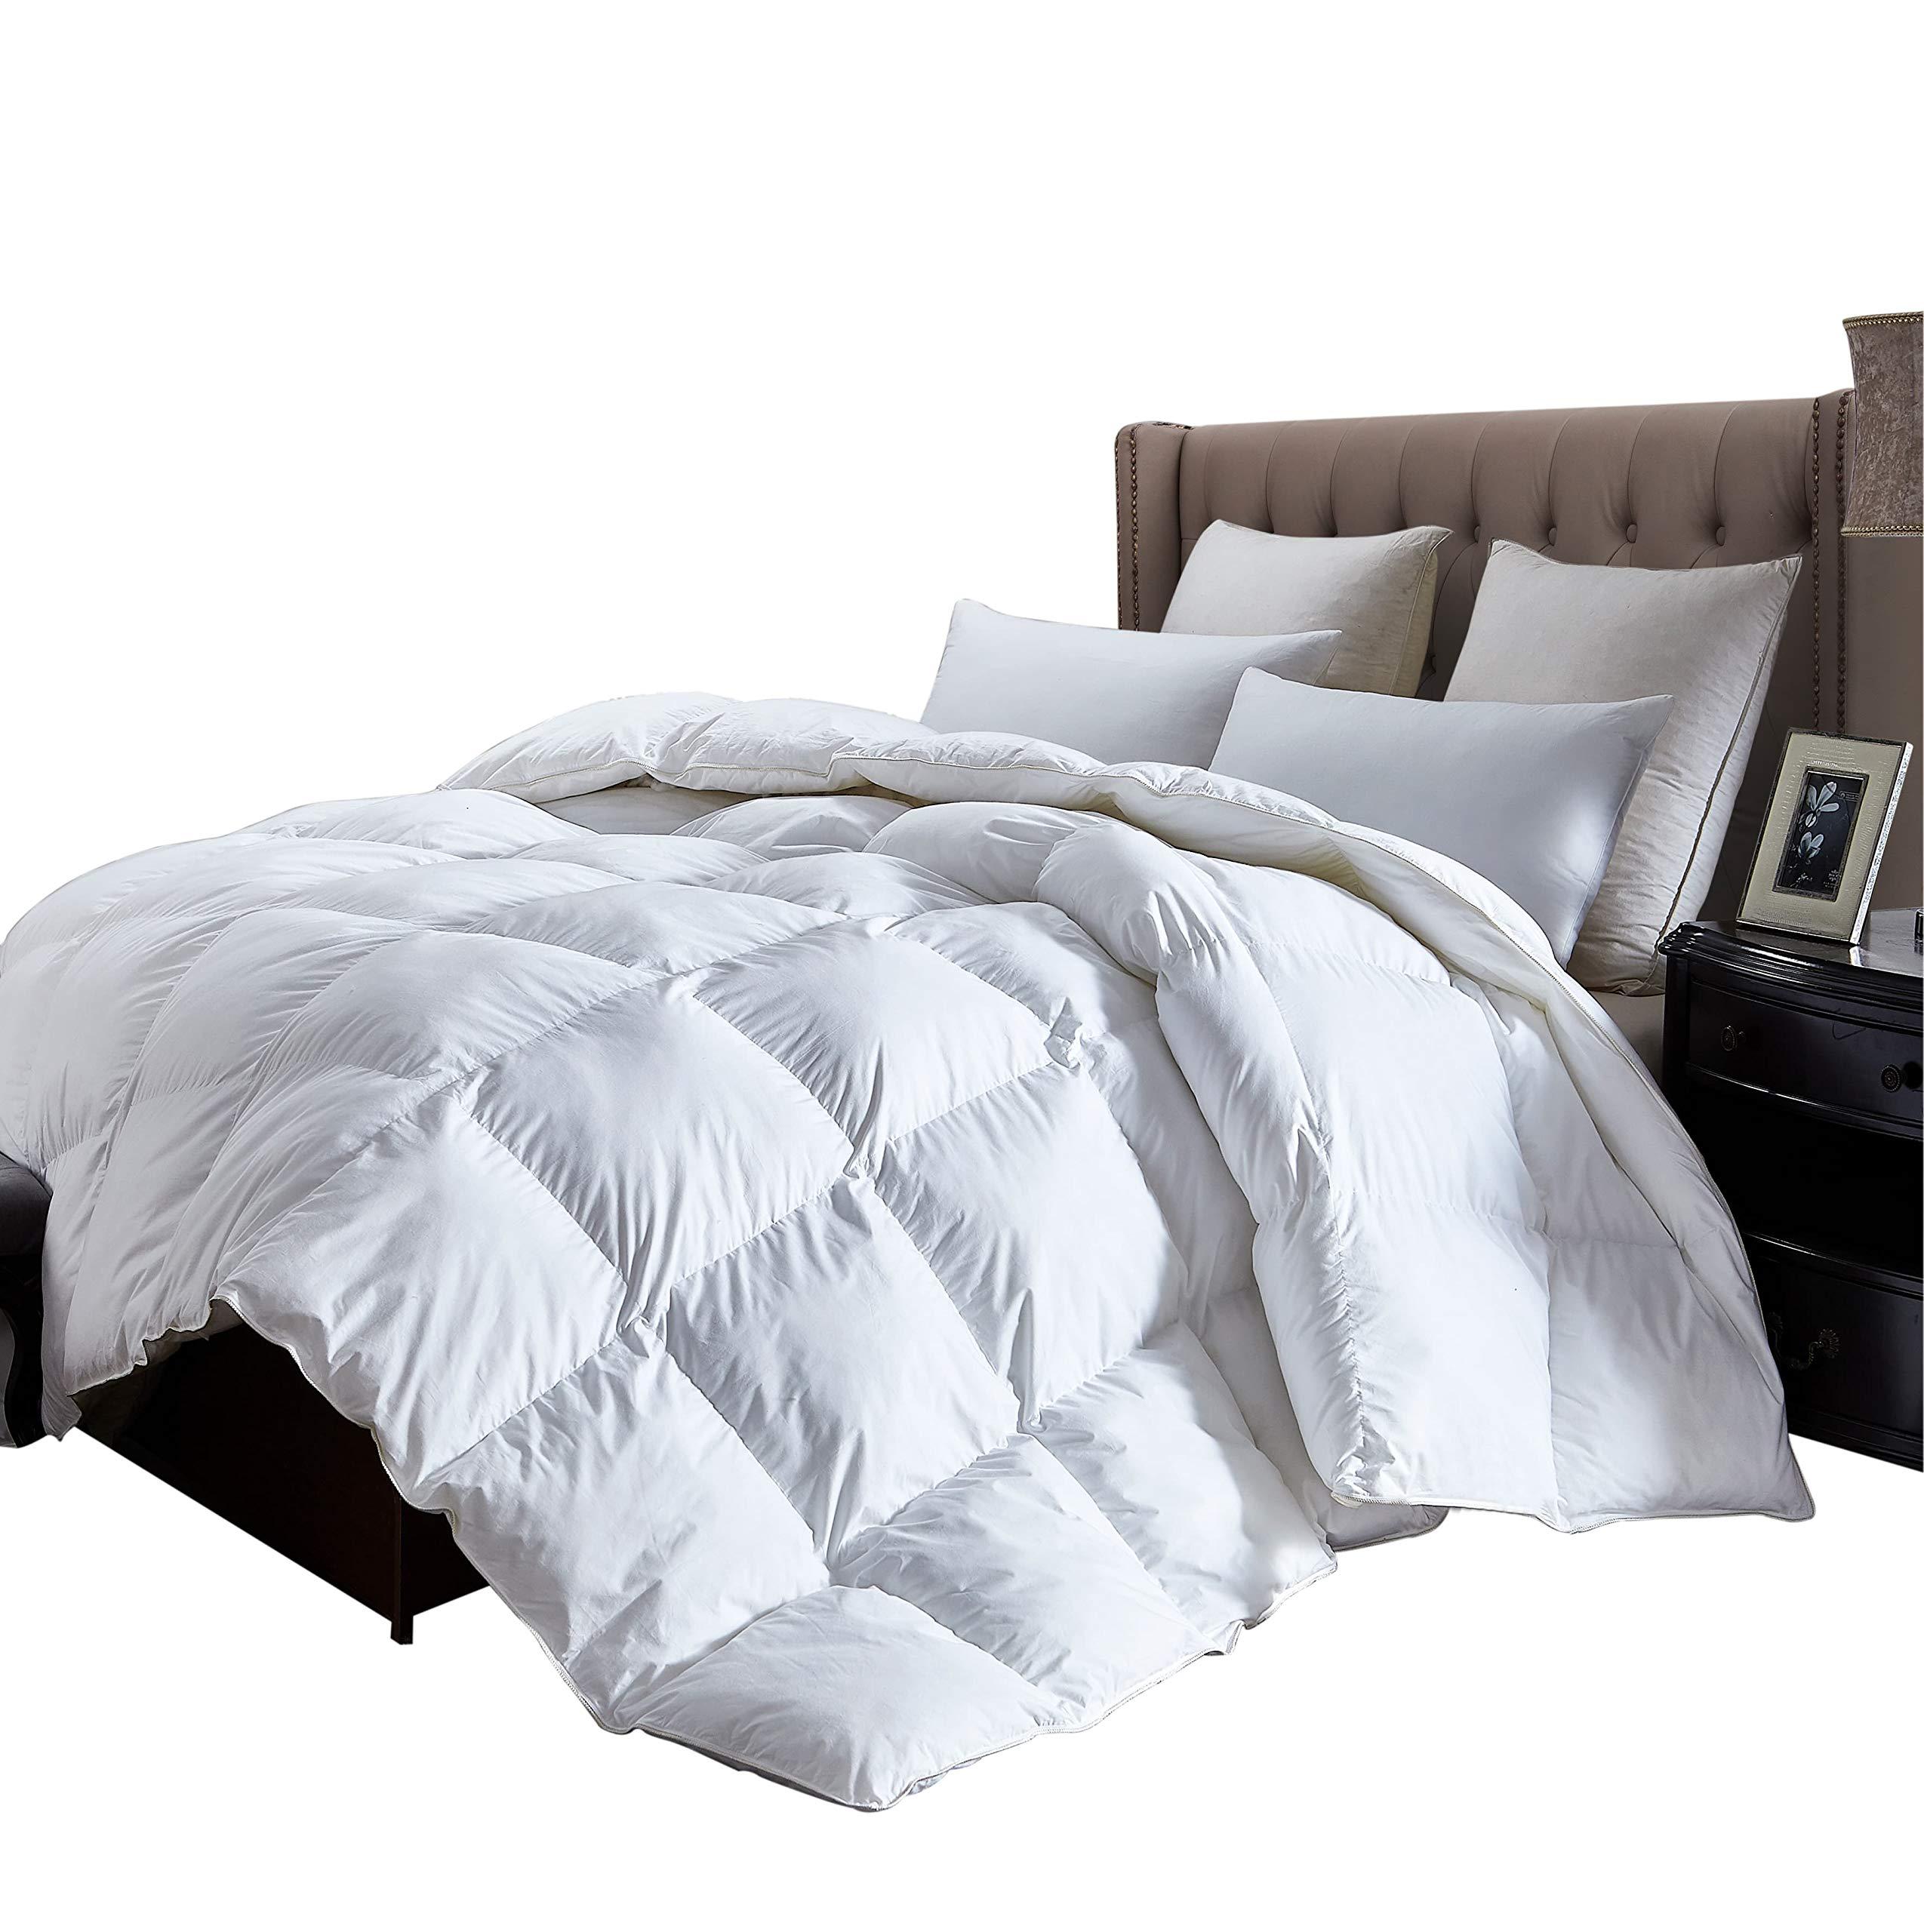 luxurious king size lightweight goose down comforter duvet insert all season 791954775662 ebay. Black Bedroom Furniture Sets. Home Design Ideas